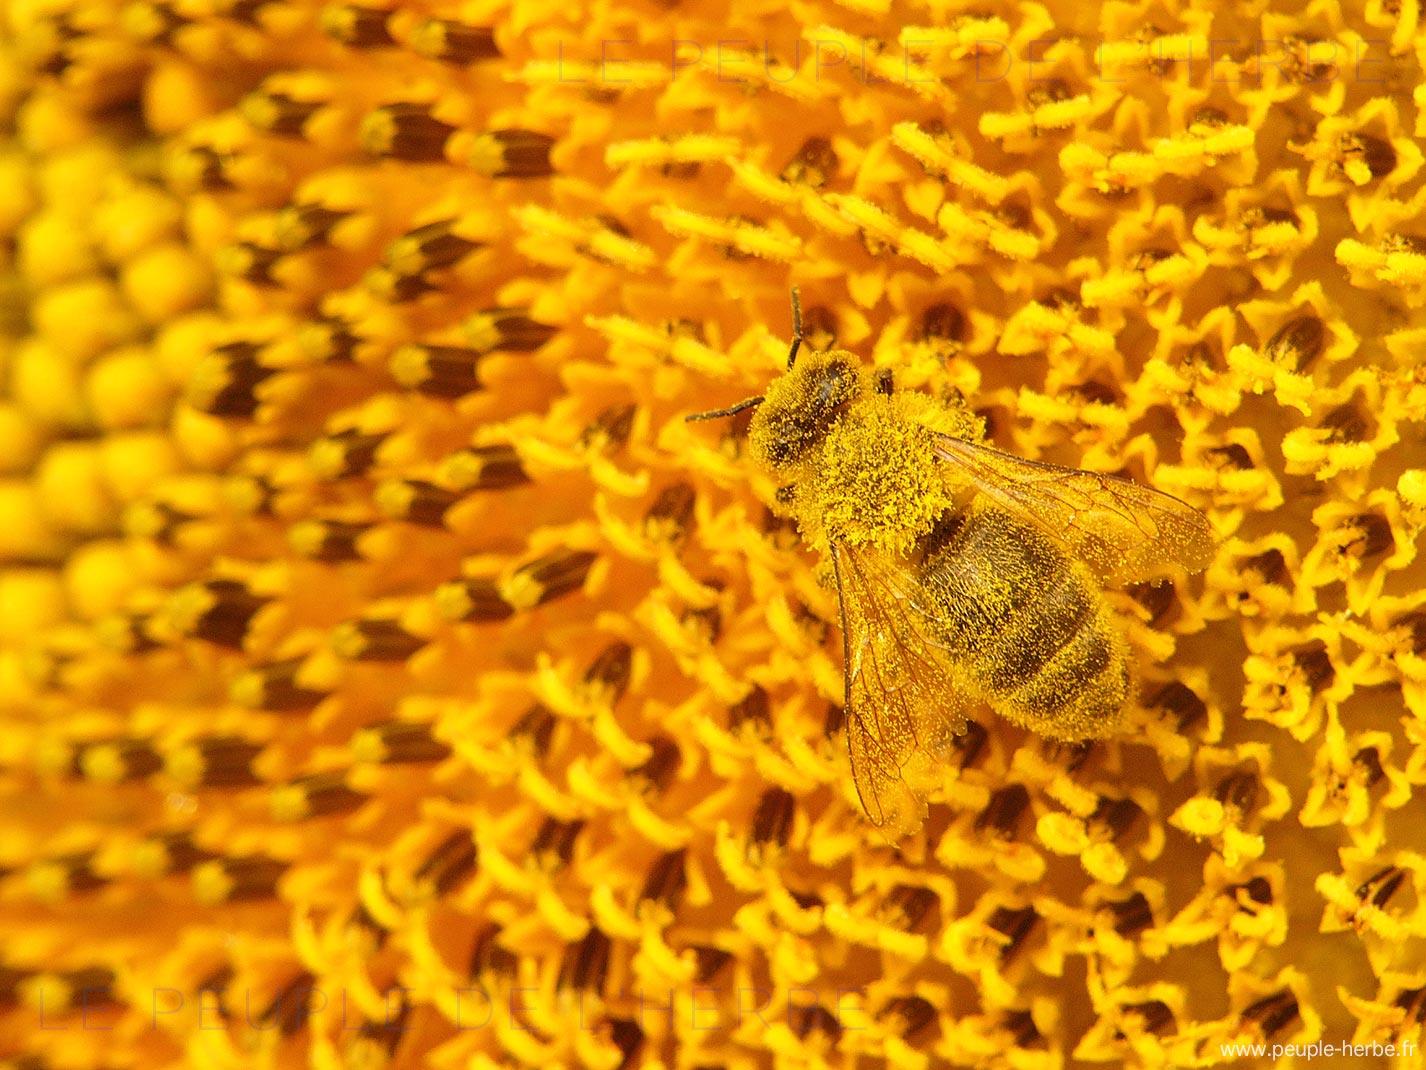 Abeille domestique recouverte de pollen